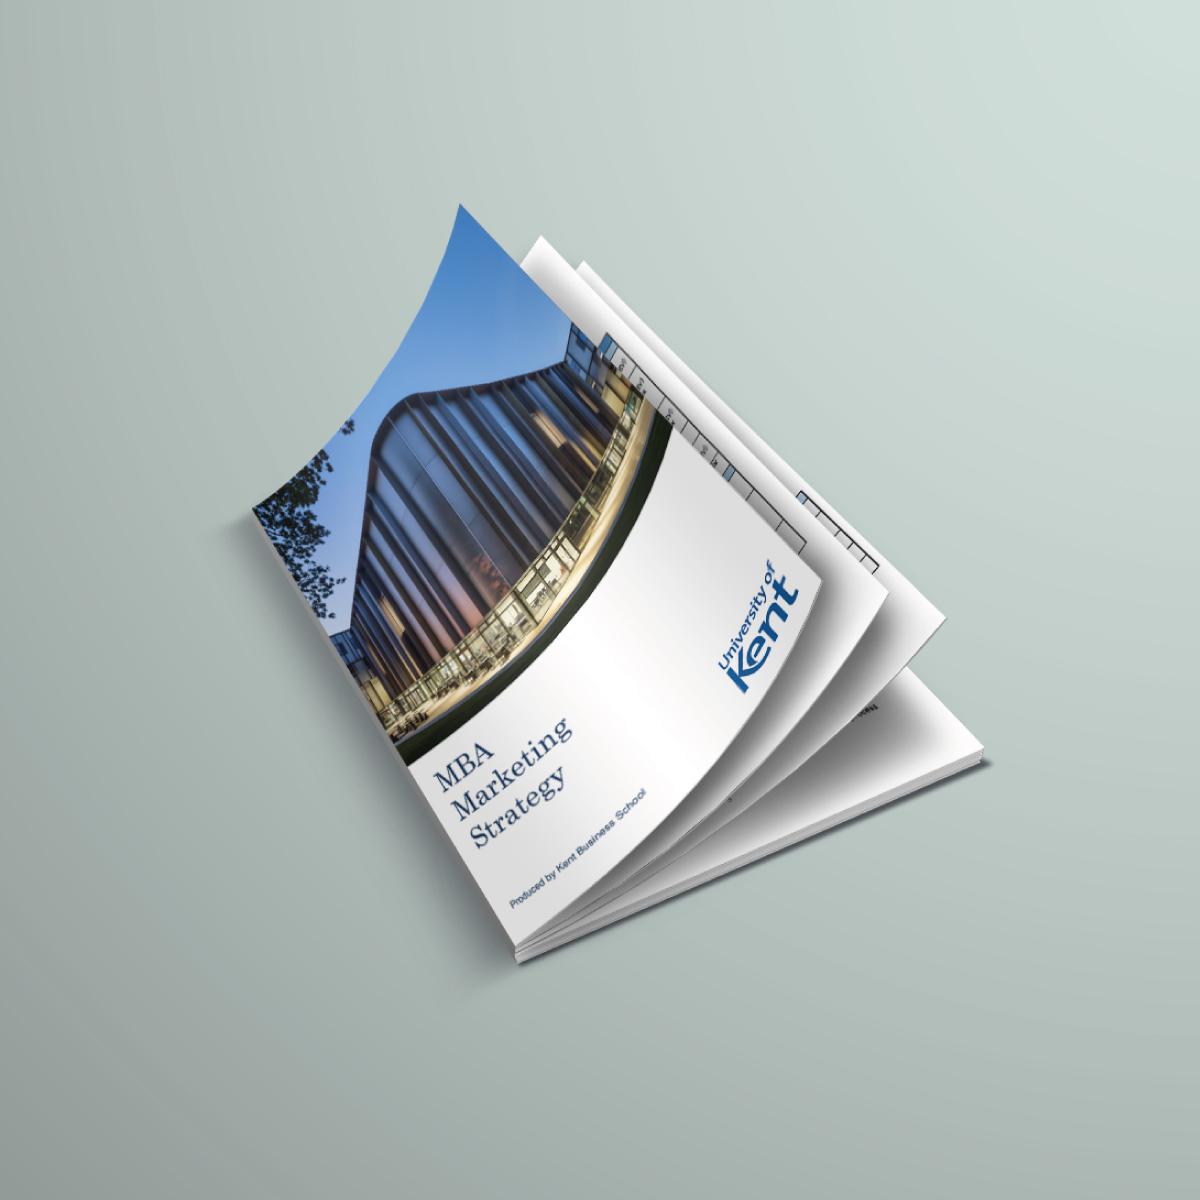 Kent Business School Strategy document